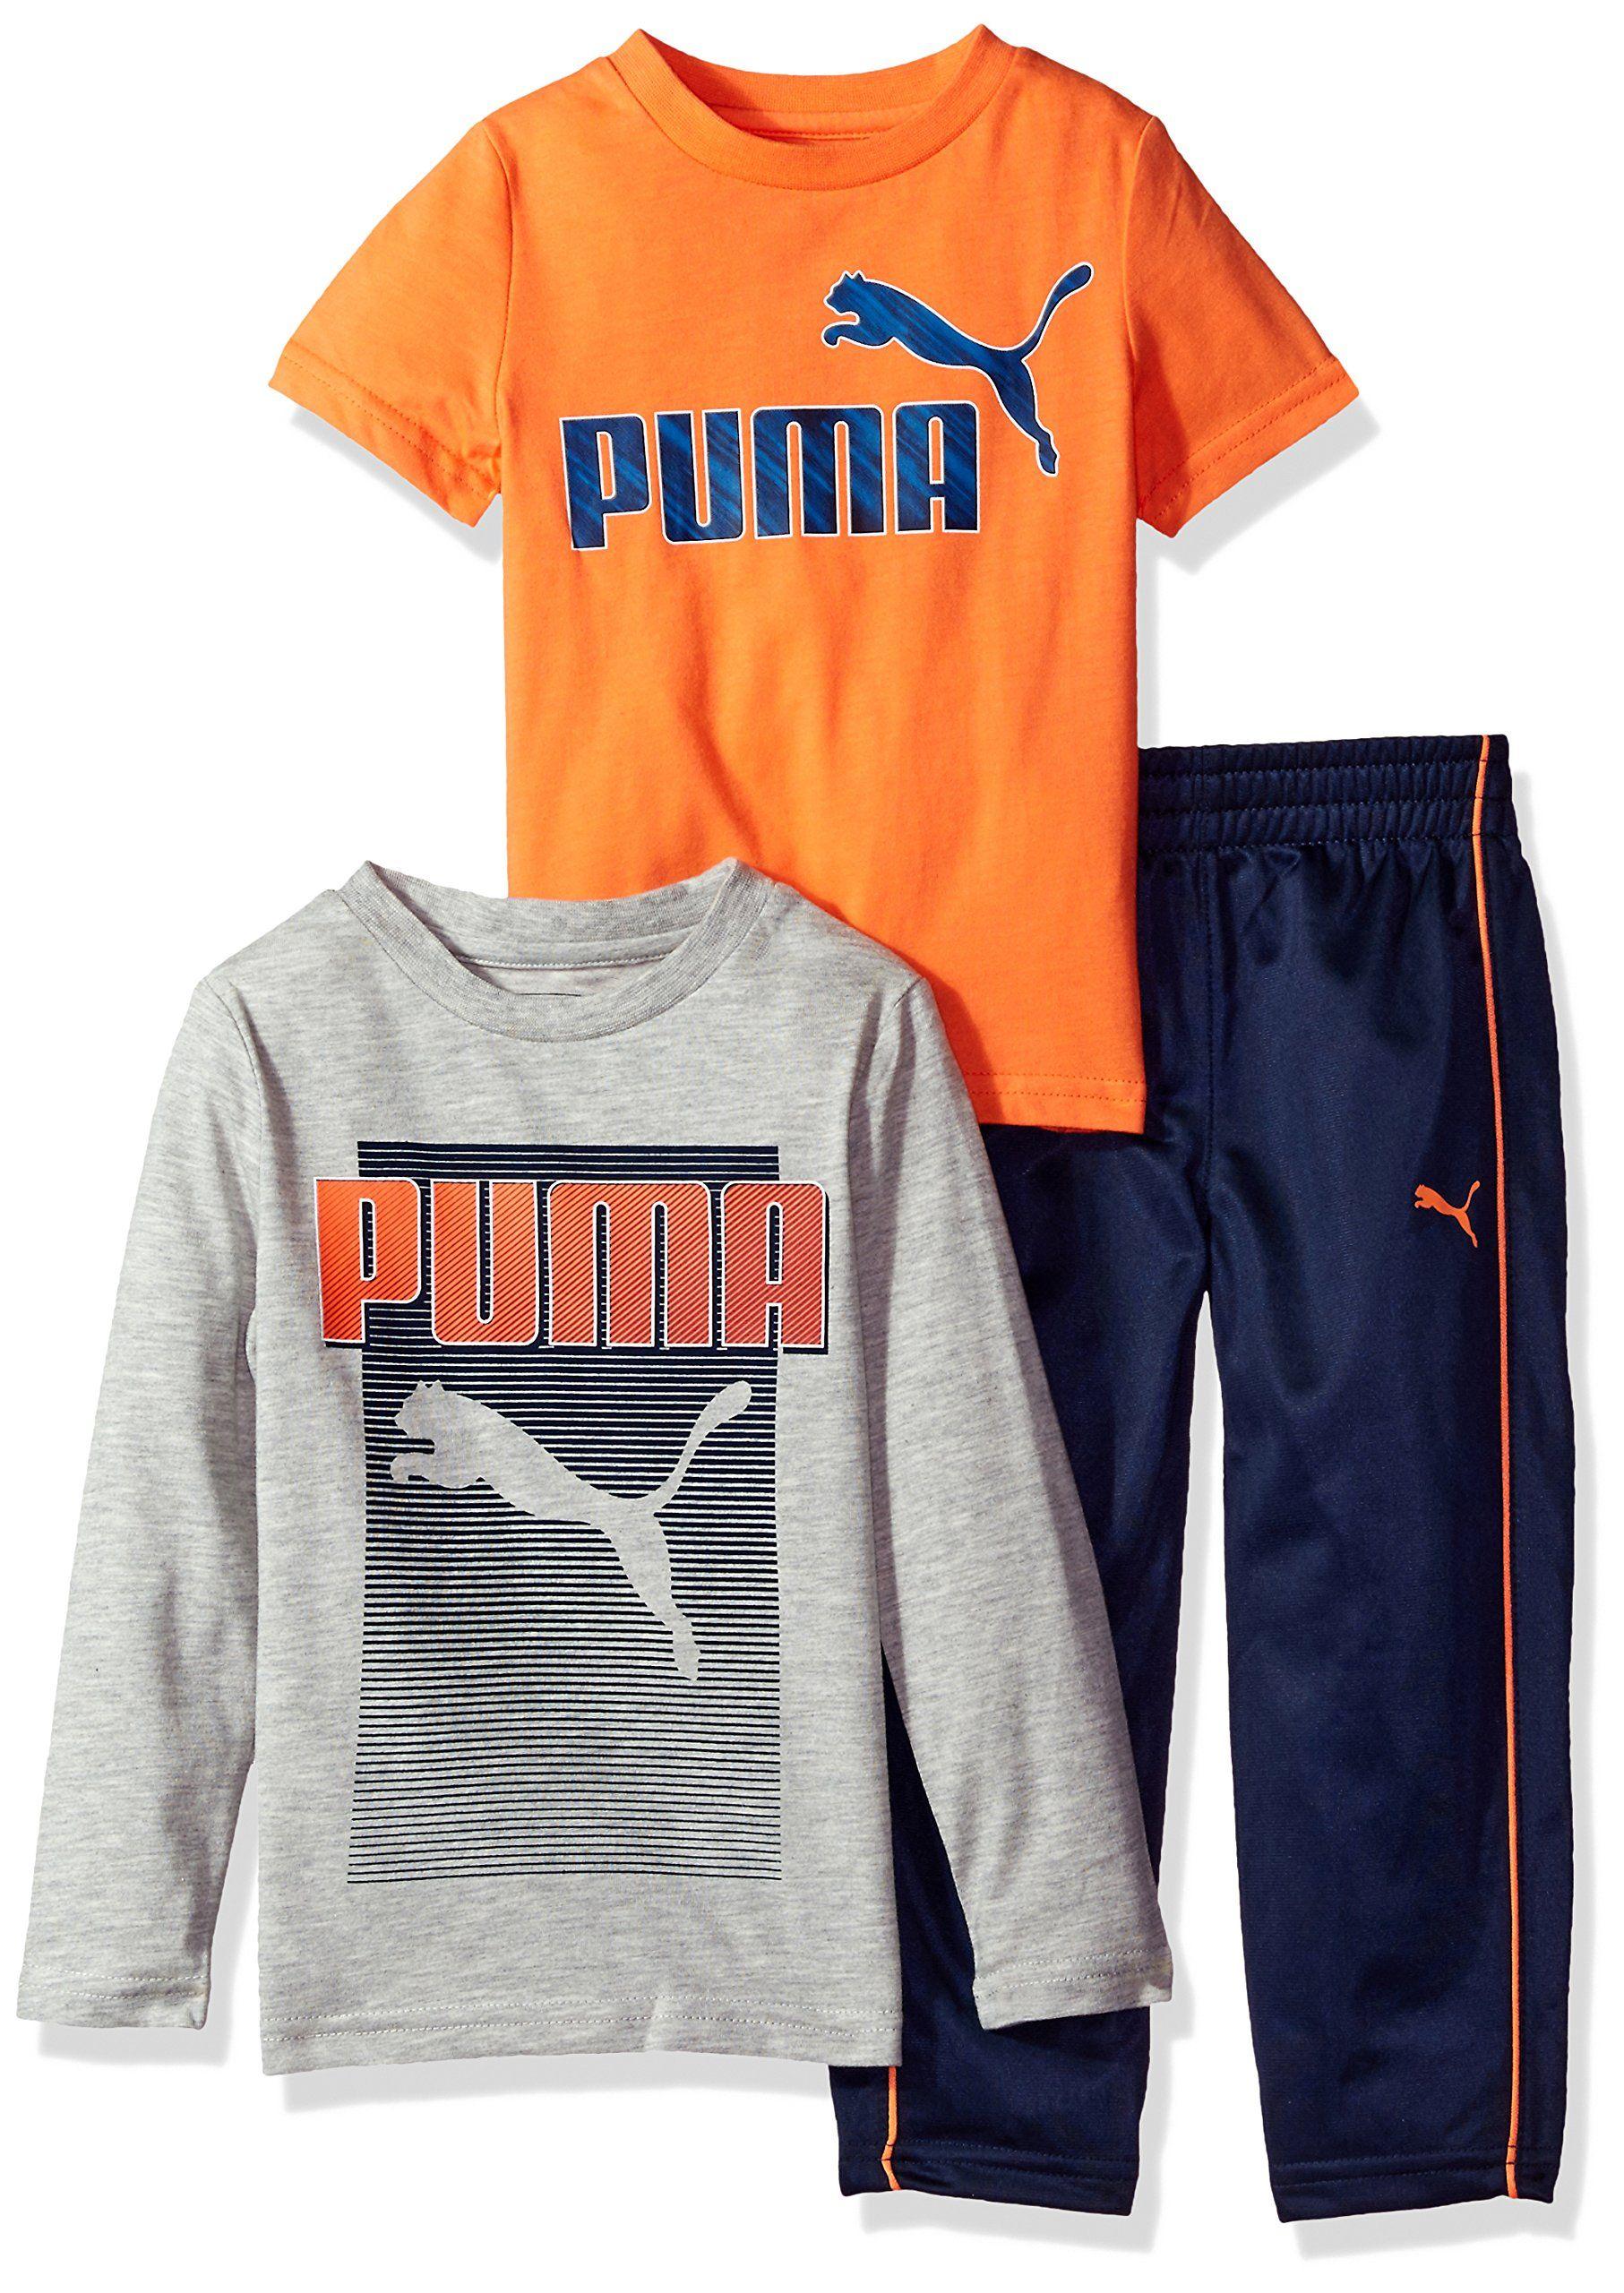 PUMA Baby Boys Three Piece T Shirt and Pant Set Light Heather Grey1